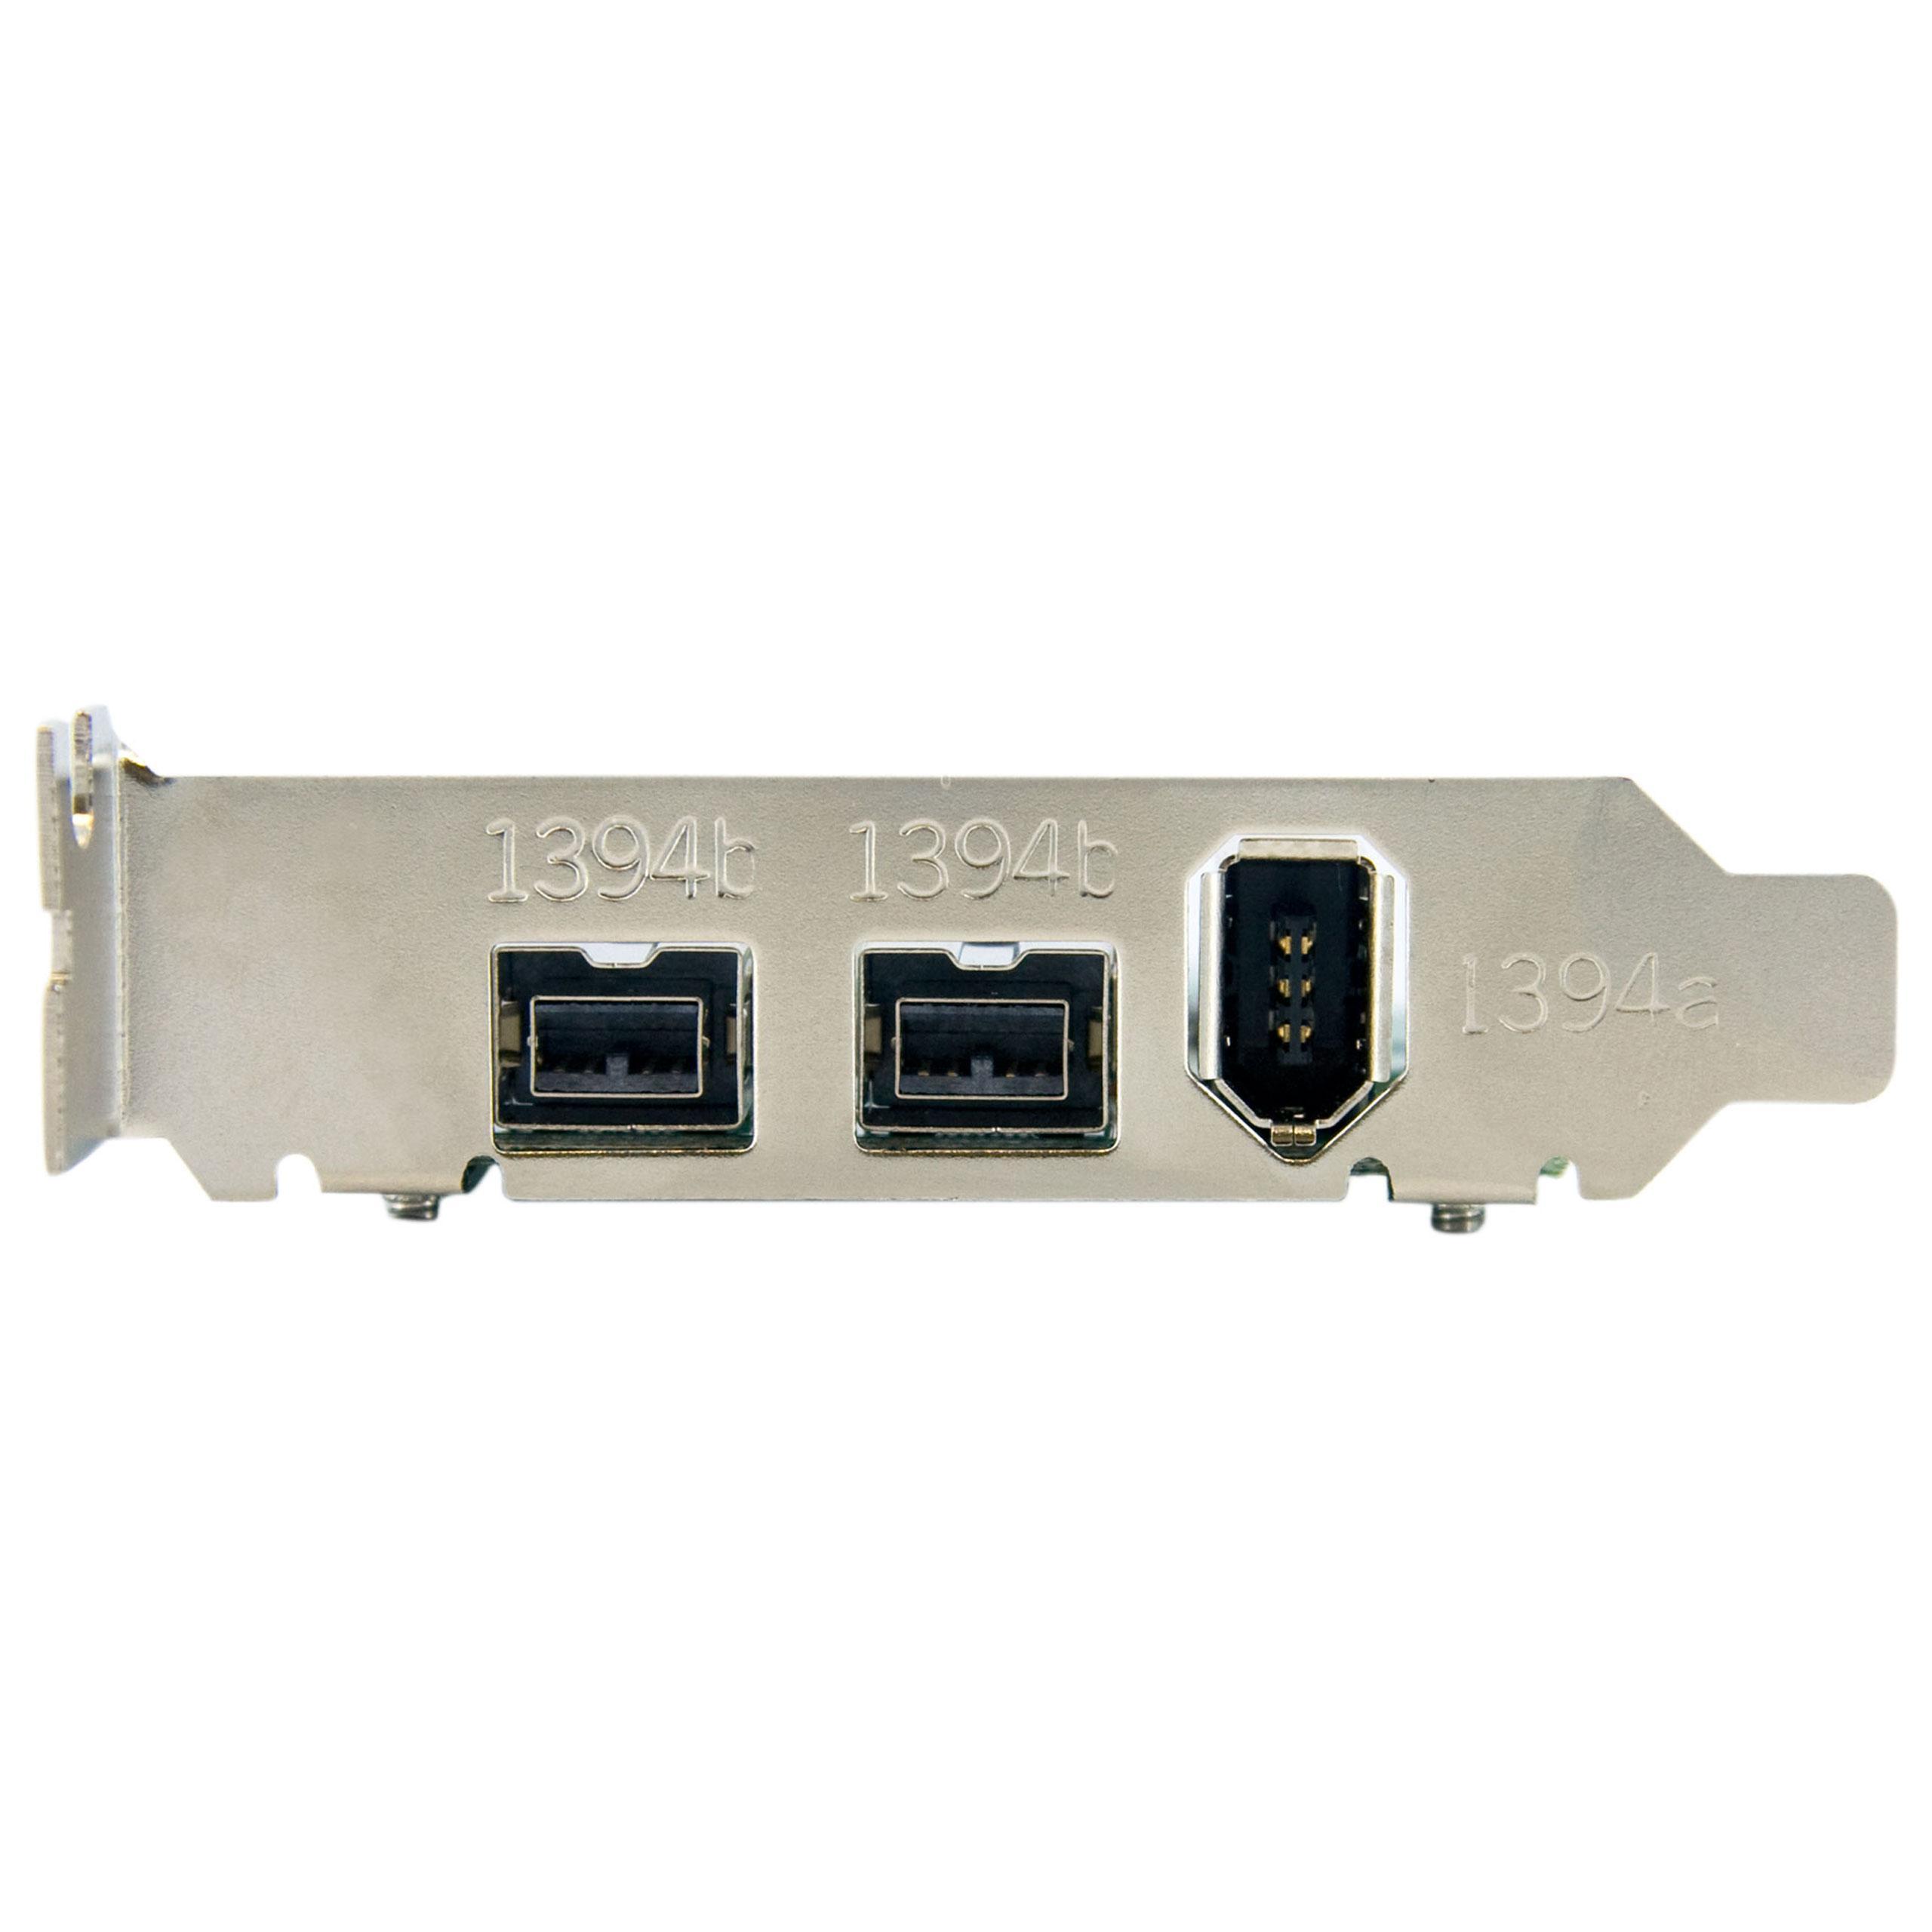 StarTech.com 3 Port 2b 1a Low Profile 1394 PCI Express: Amazon.co.uk ...